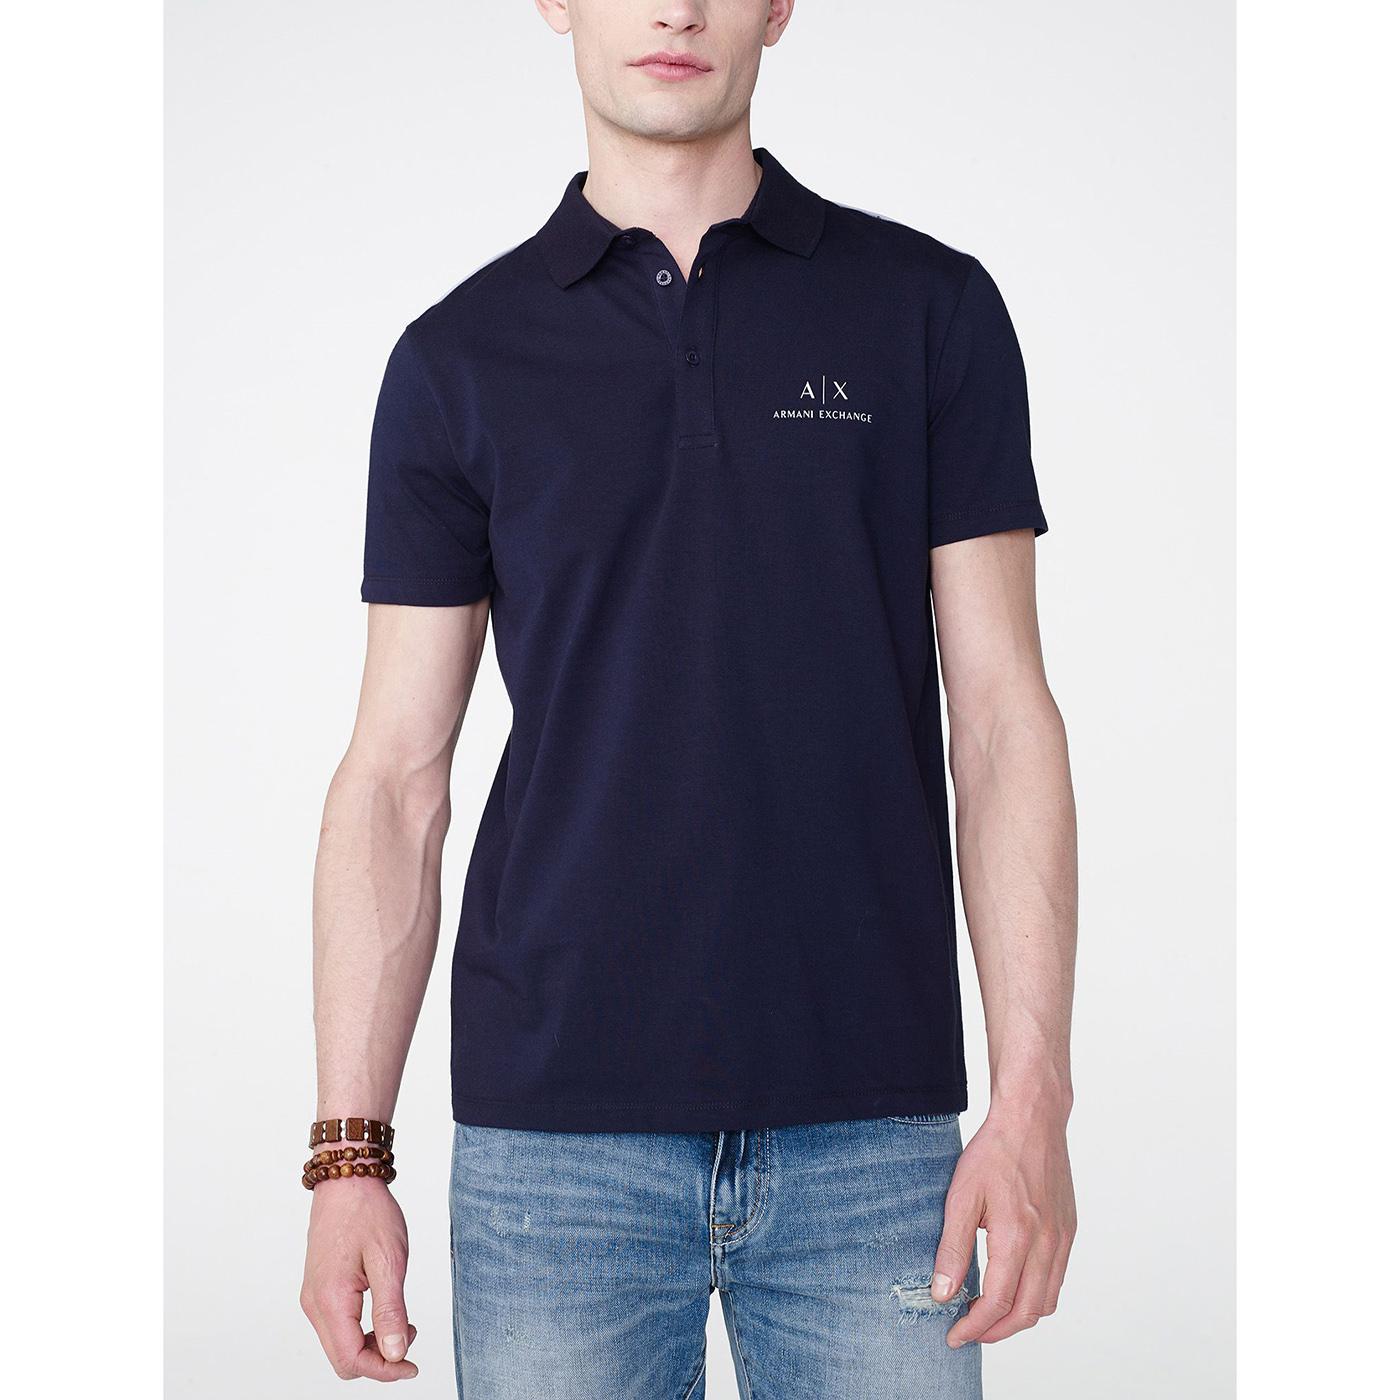 美國百分百【Armani Exchange】polo衫 AX 短袖 上衣 素面 logo 非網眼 深藍 H051